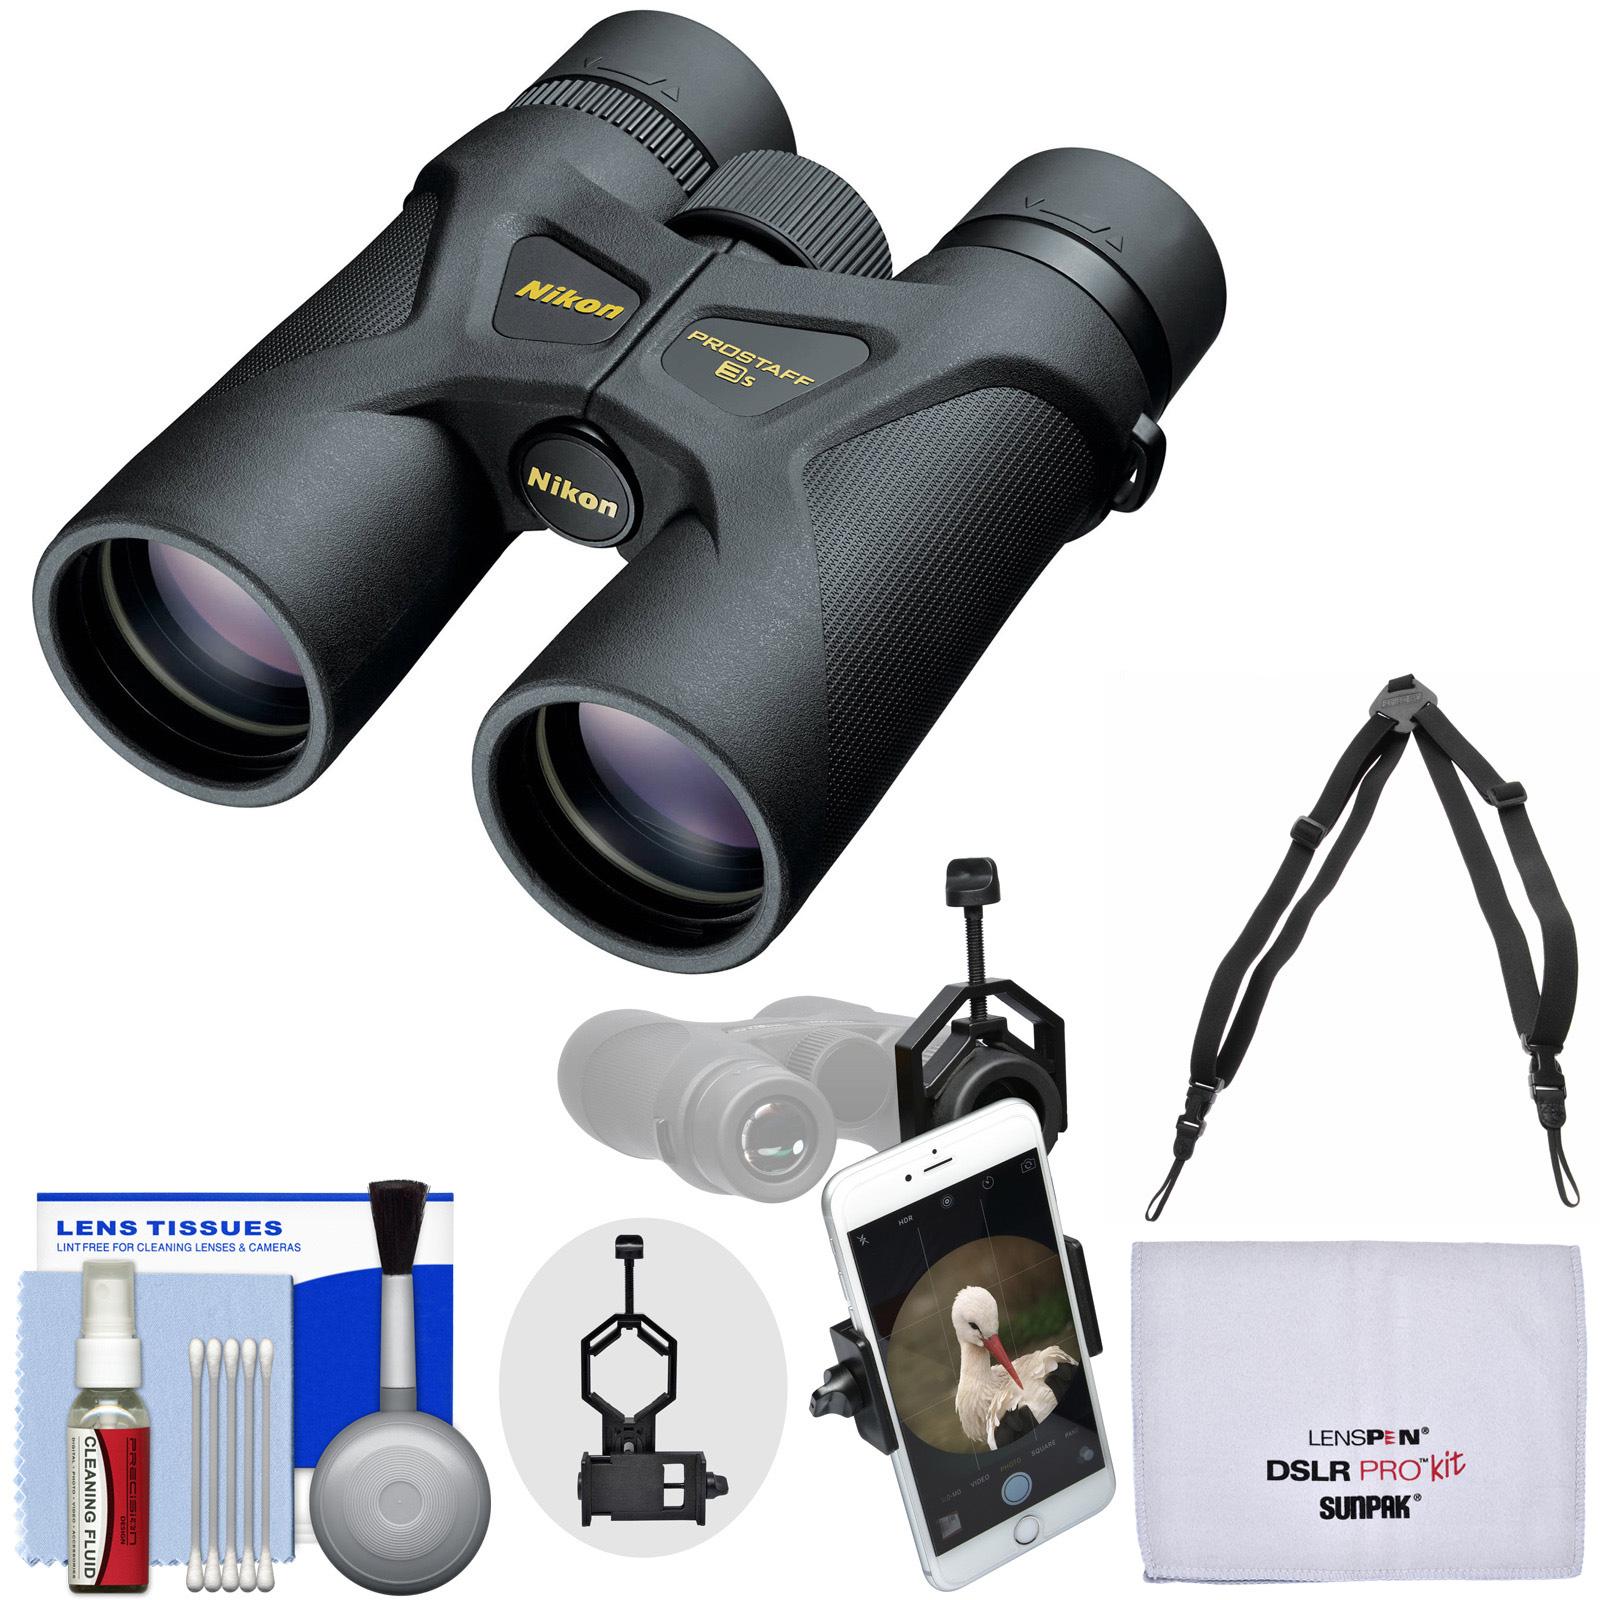 Nikon Prostaff 3S 8x42 Waterproof / Fogproof Binoculars with Case + Harness + Smartphone Adapter + Cleaning Kit